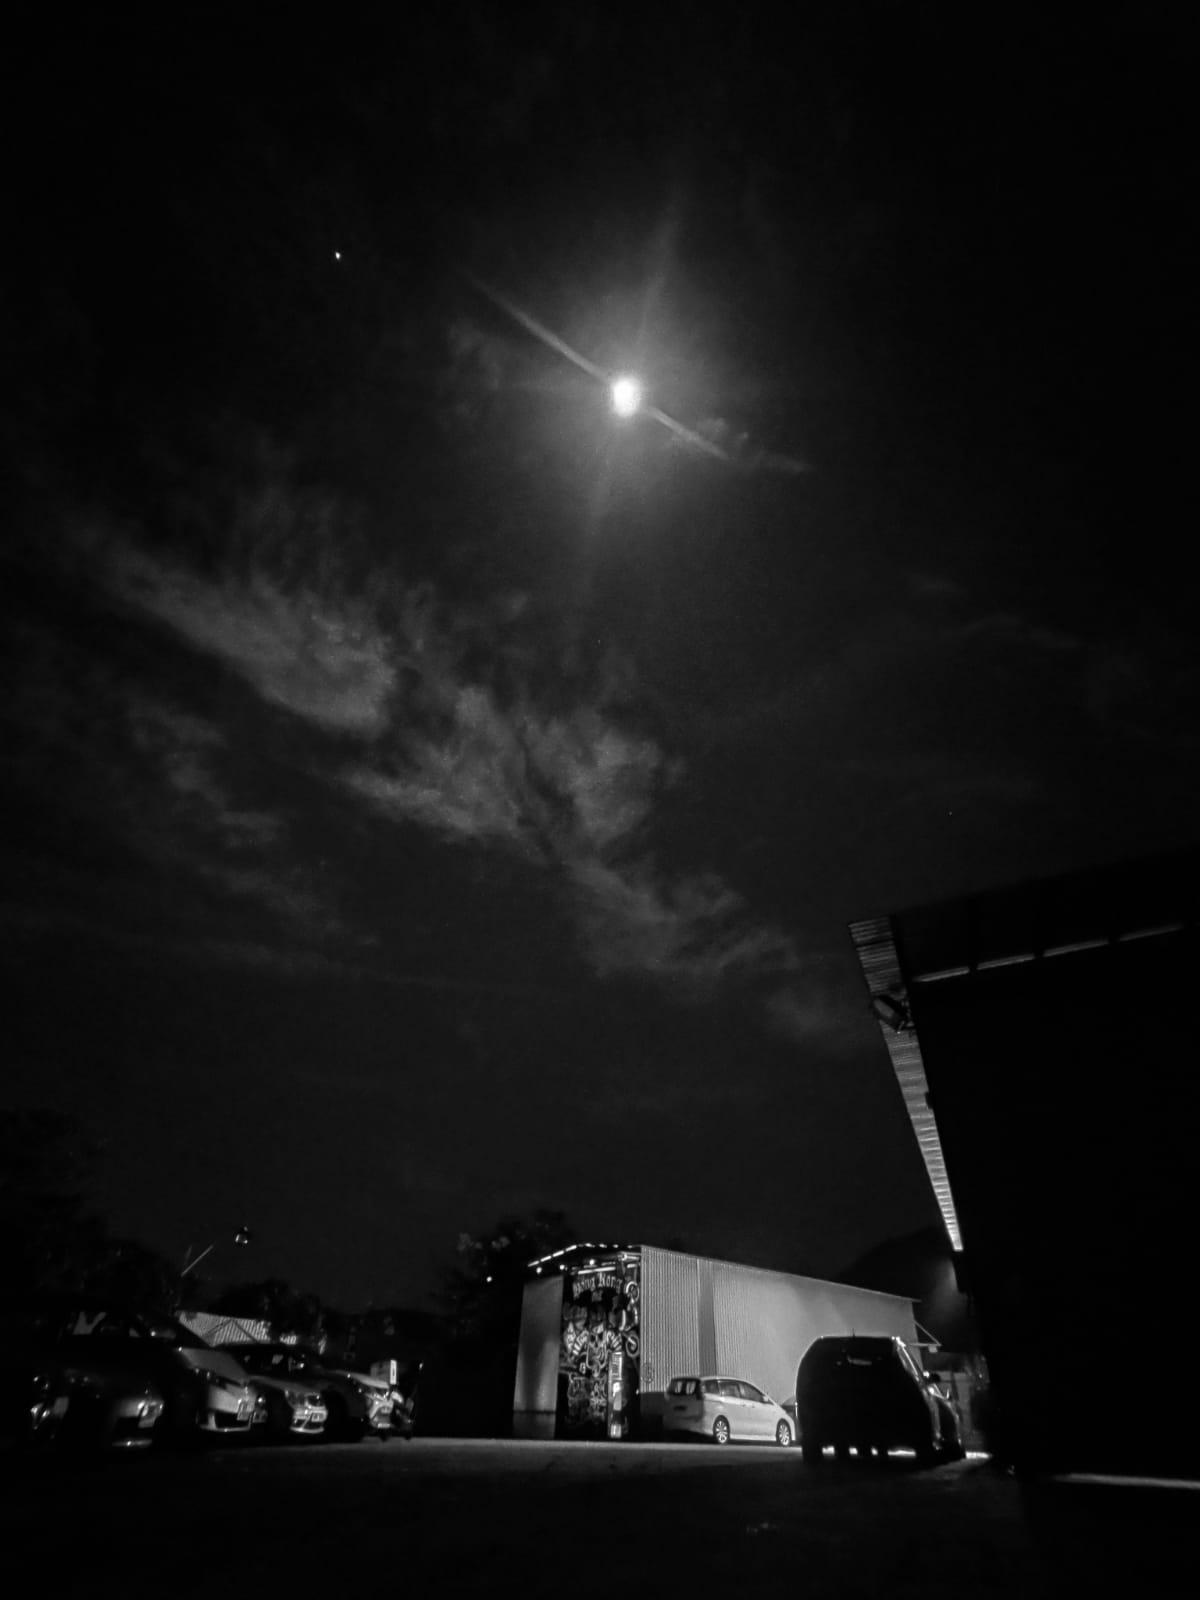 Photo 2-10-2020, 12 05 40 AM